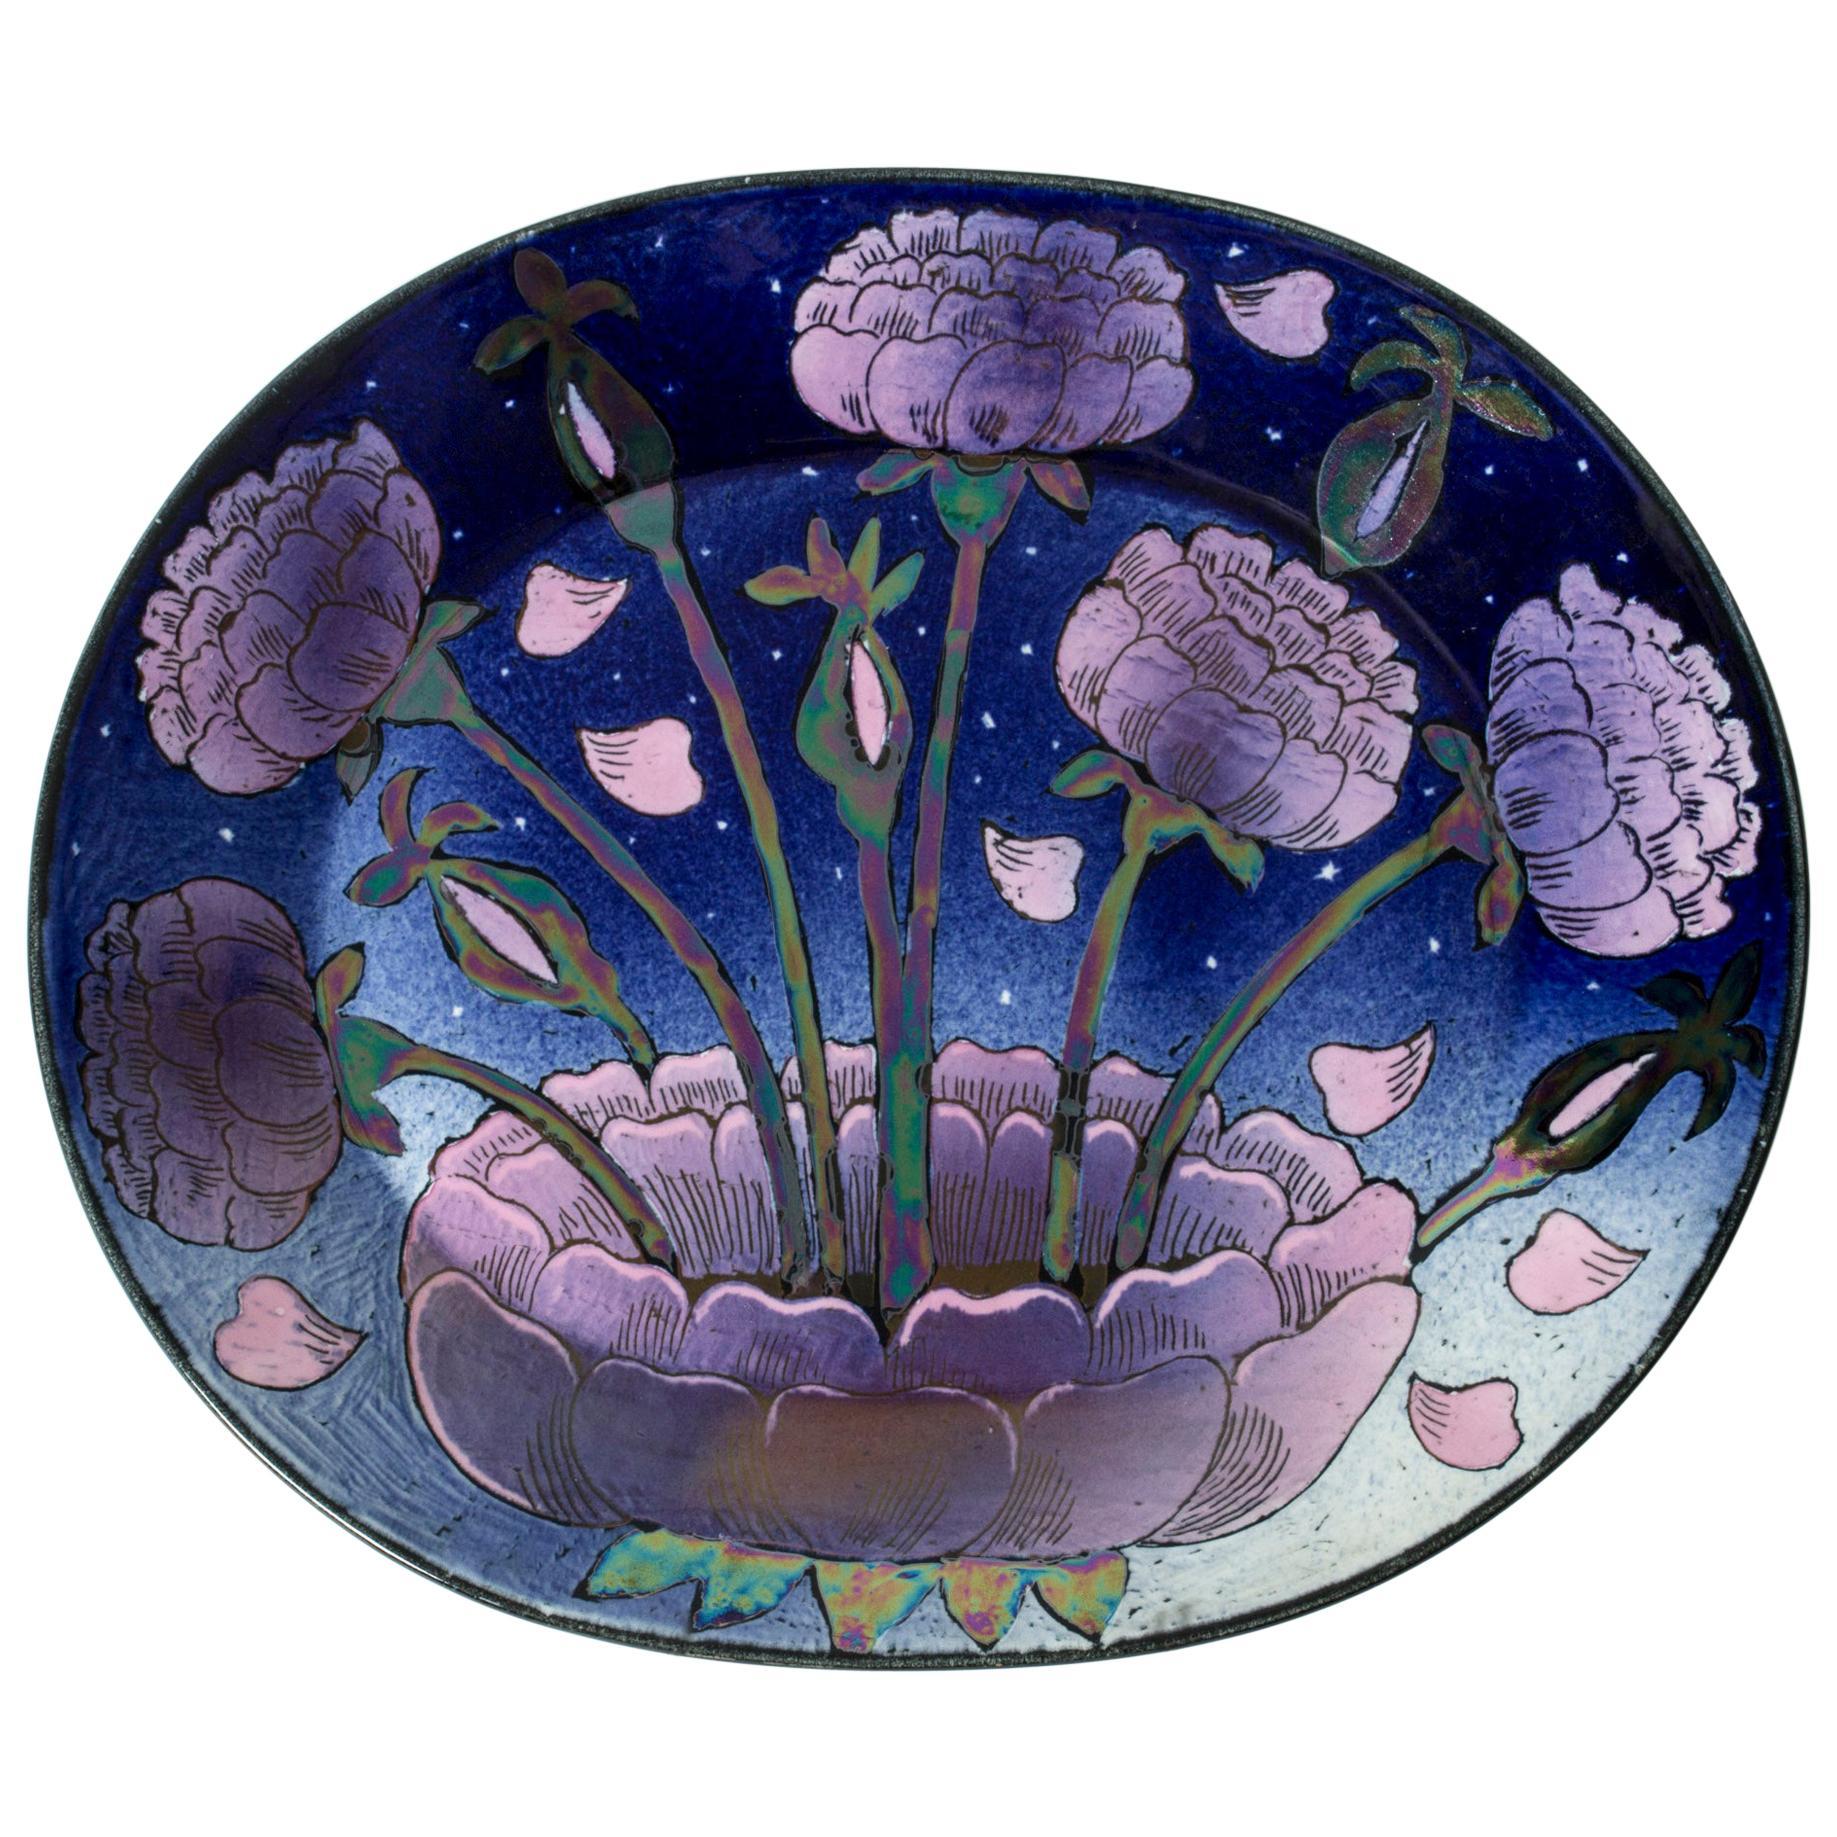 Stoneware Platter by Birger Kaipiainen for Arabia, Finland, 1960s